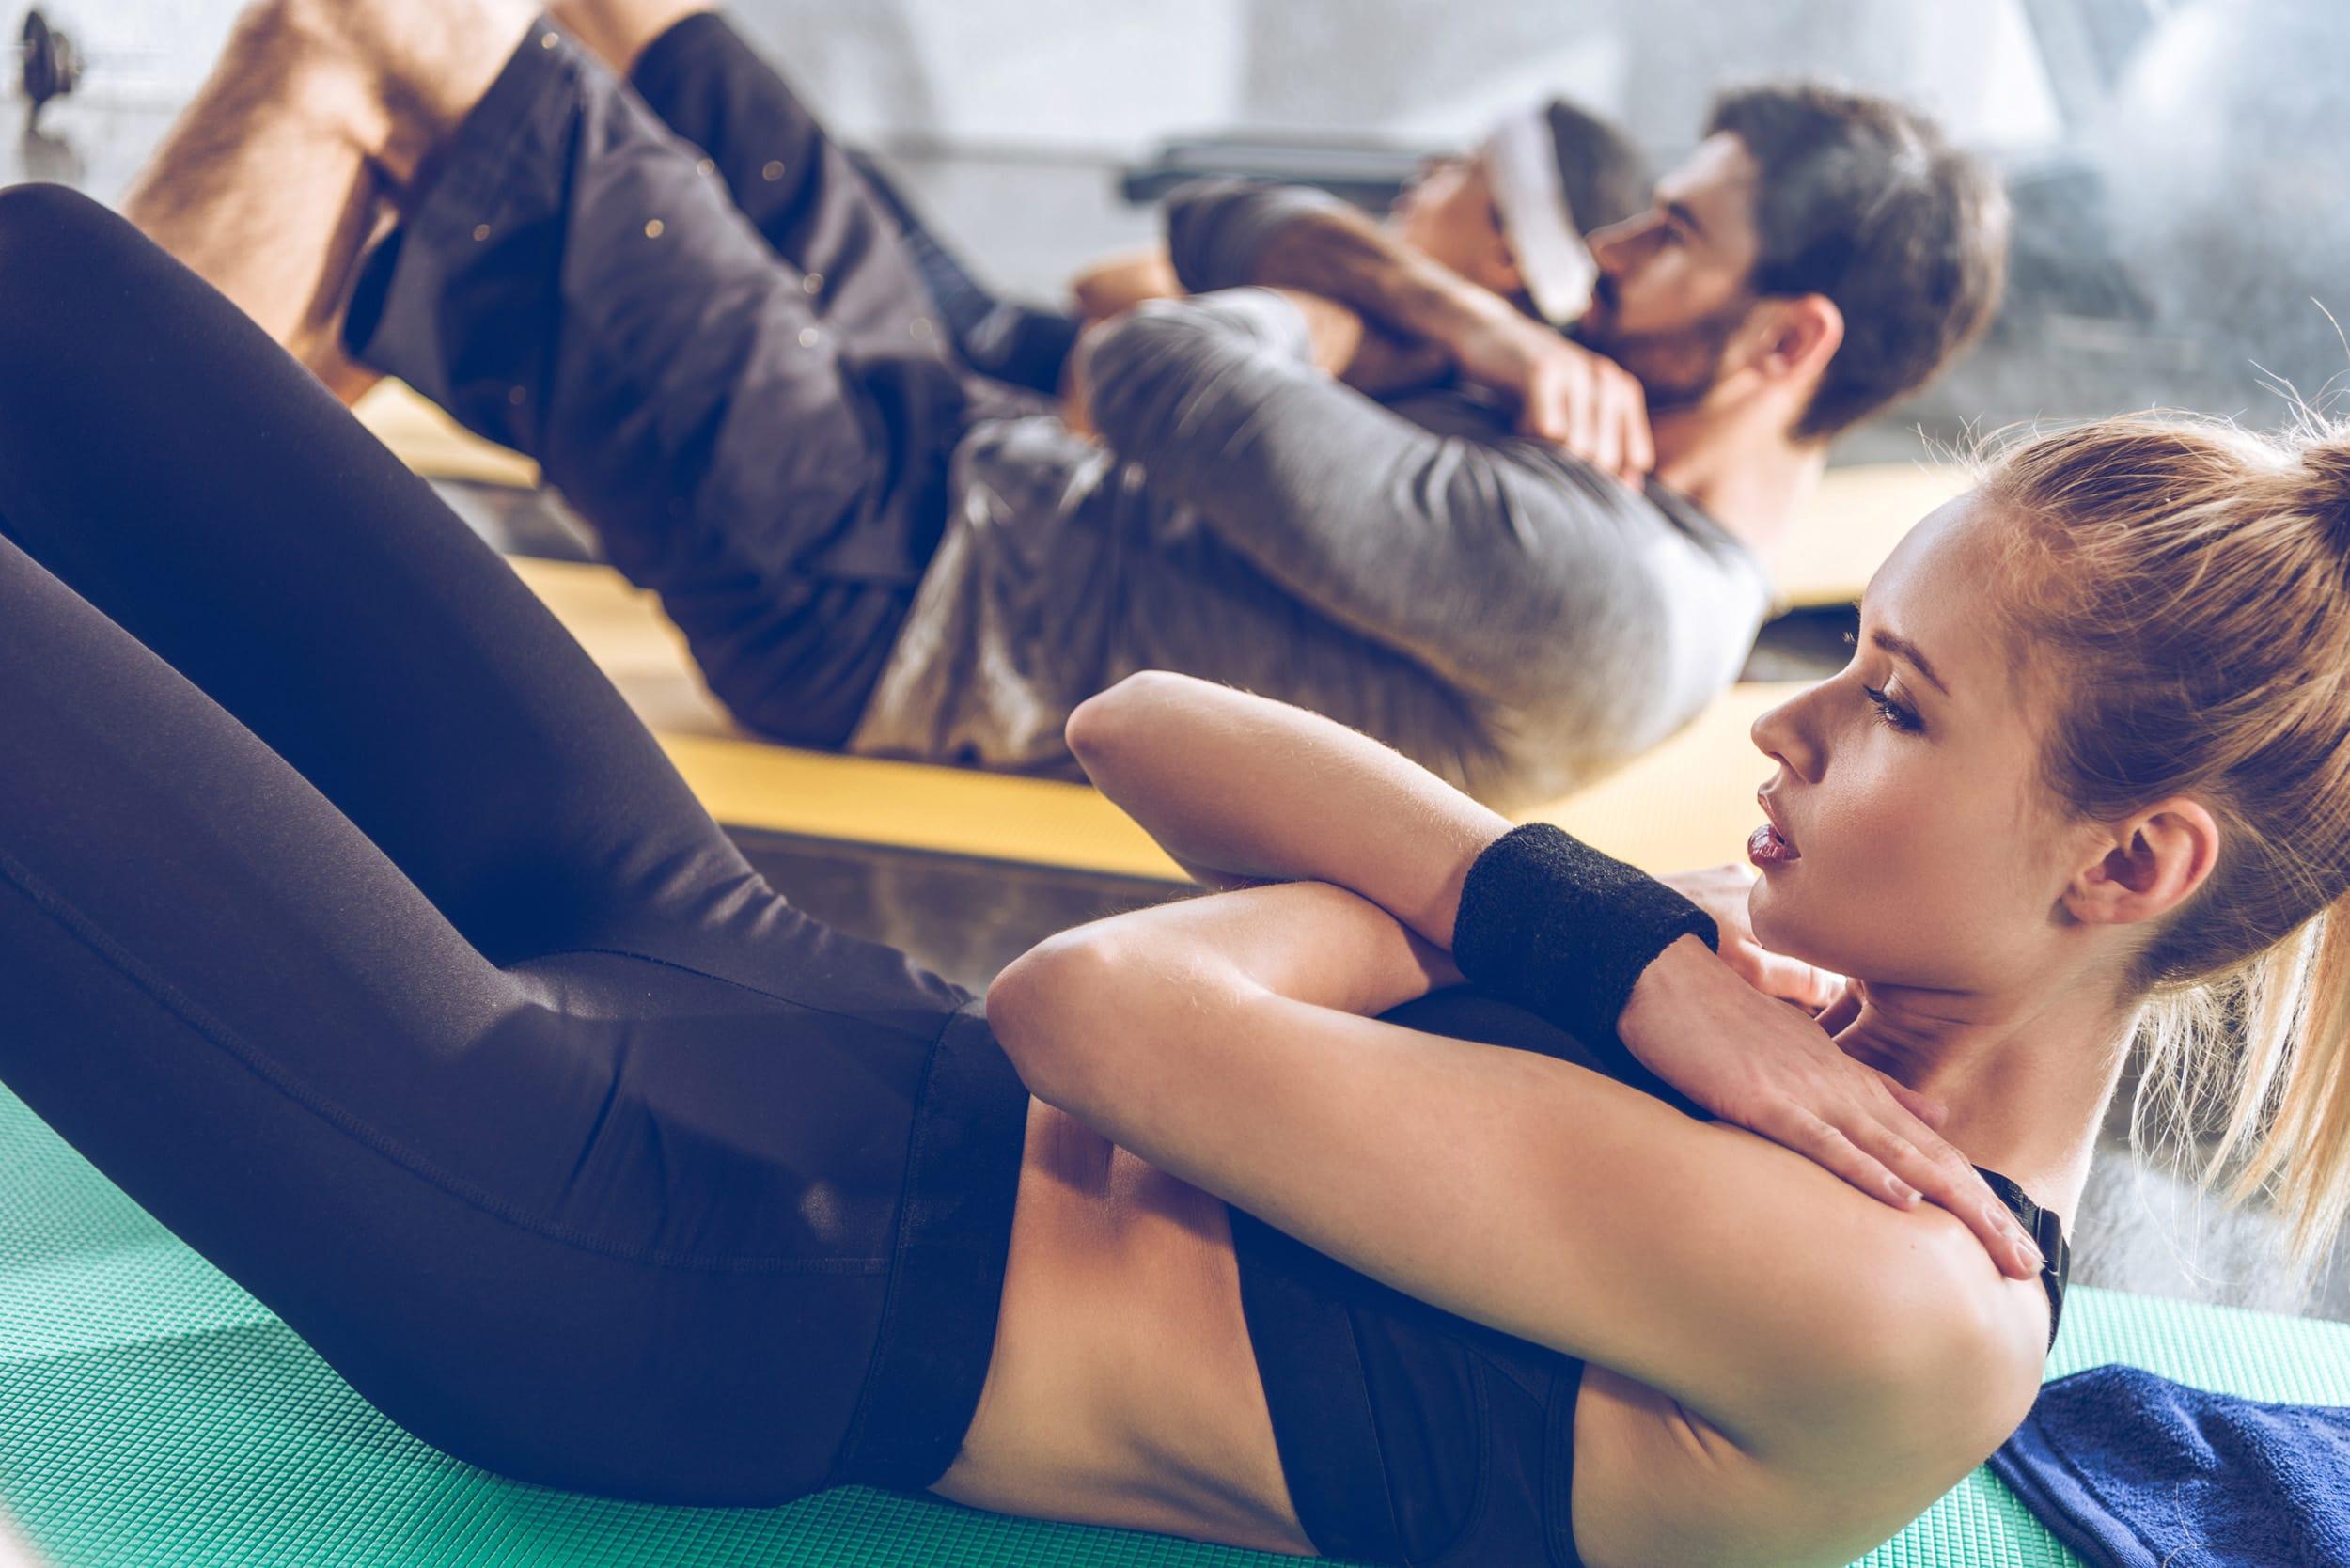 Kurs Functional Training | Yoga Ma Stuttgart